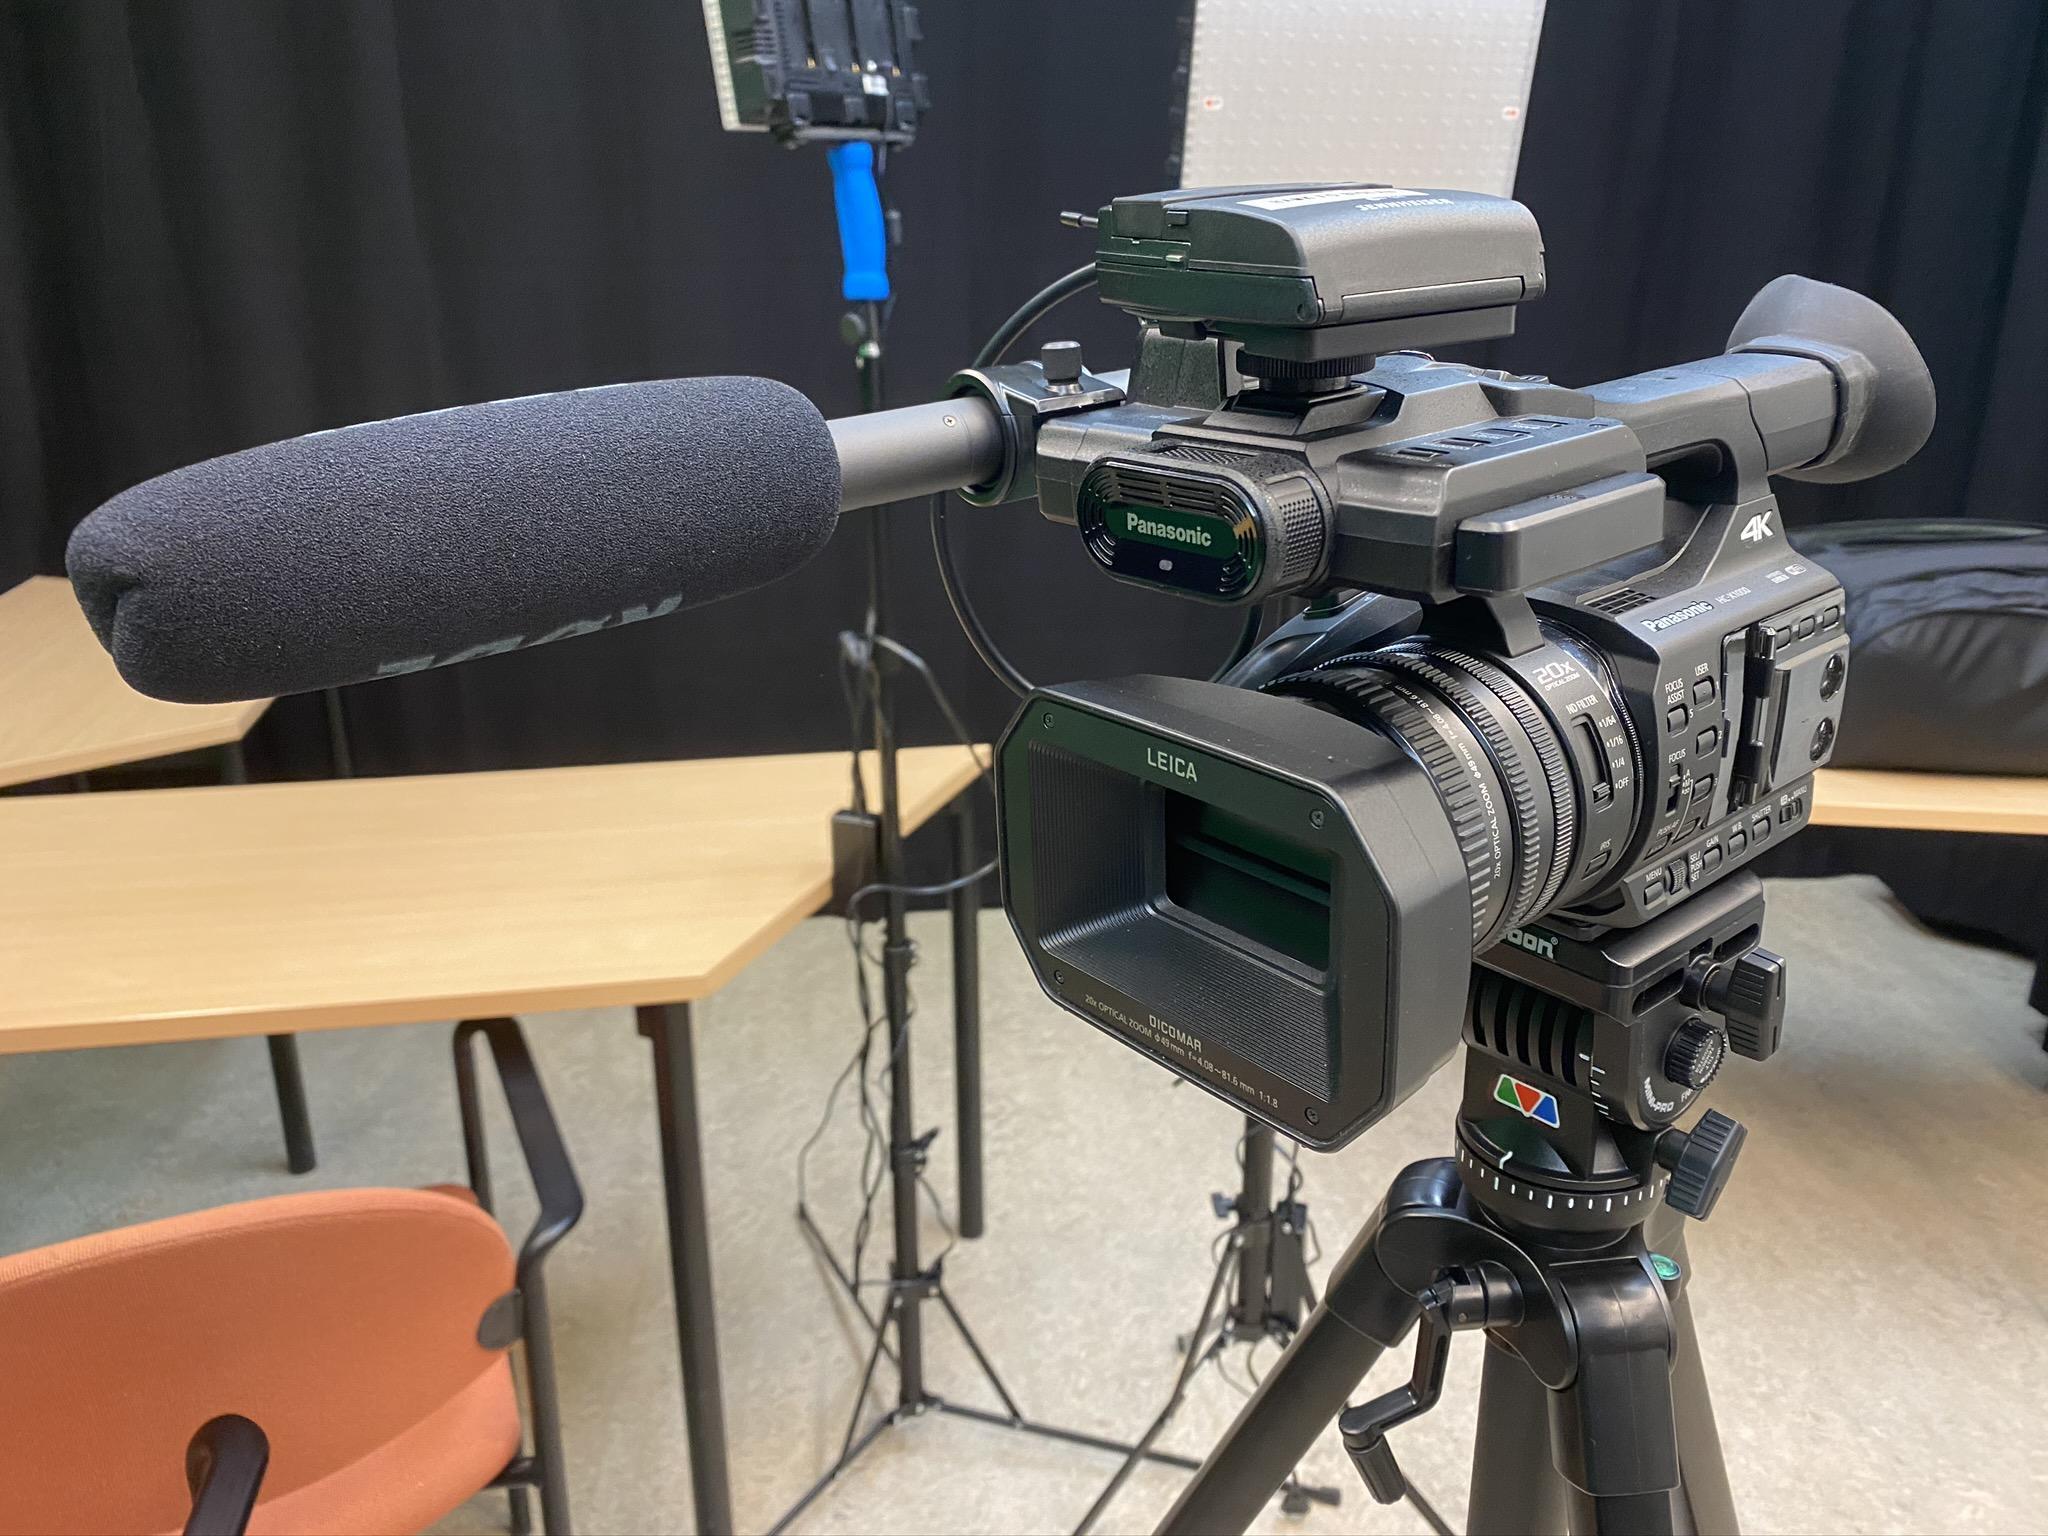 Panasonic 4k videokamera.